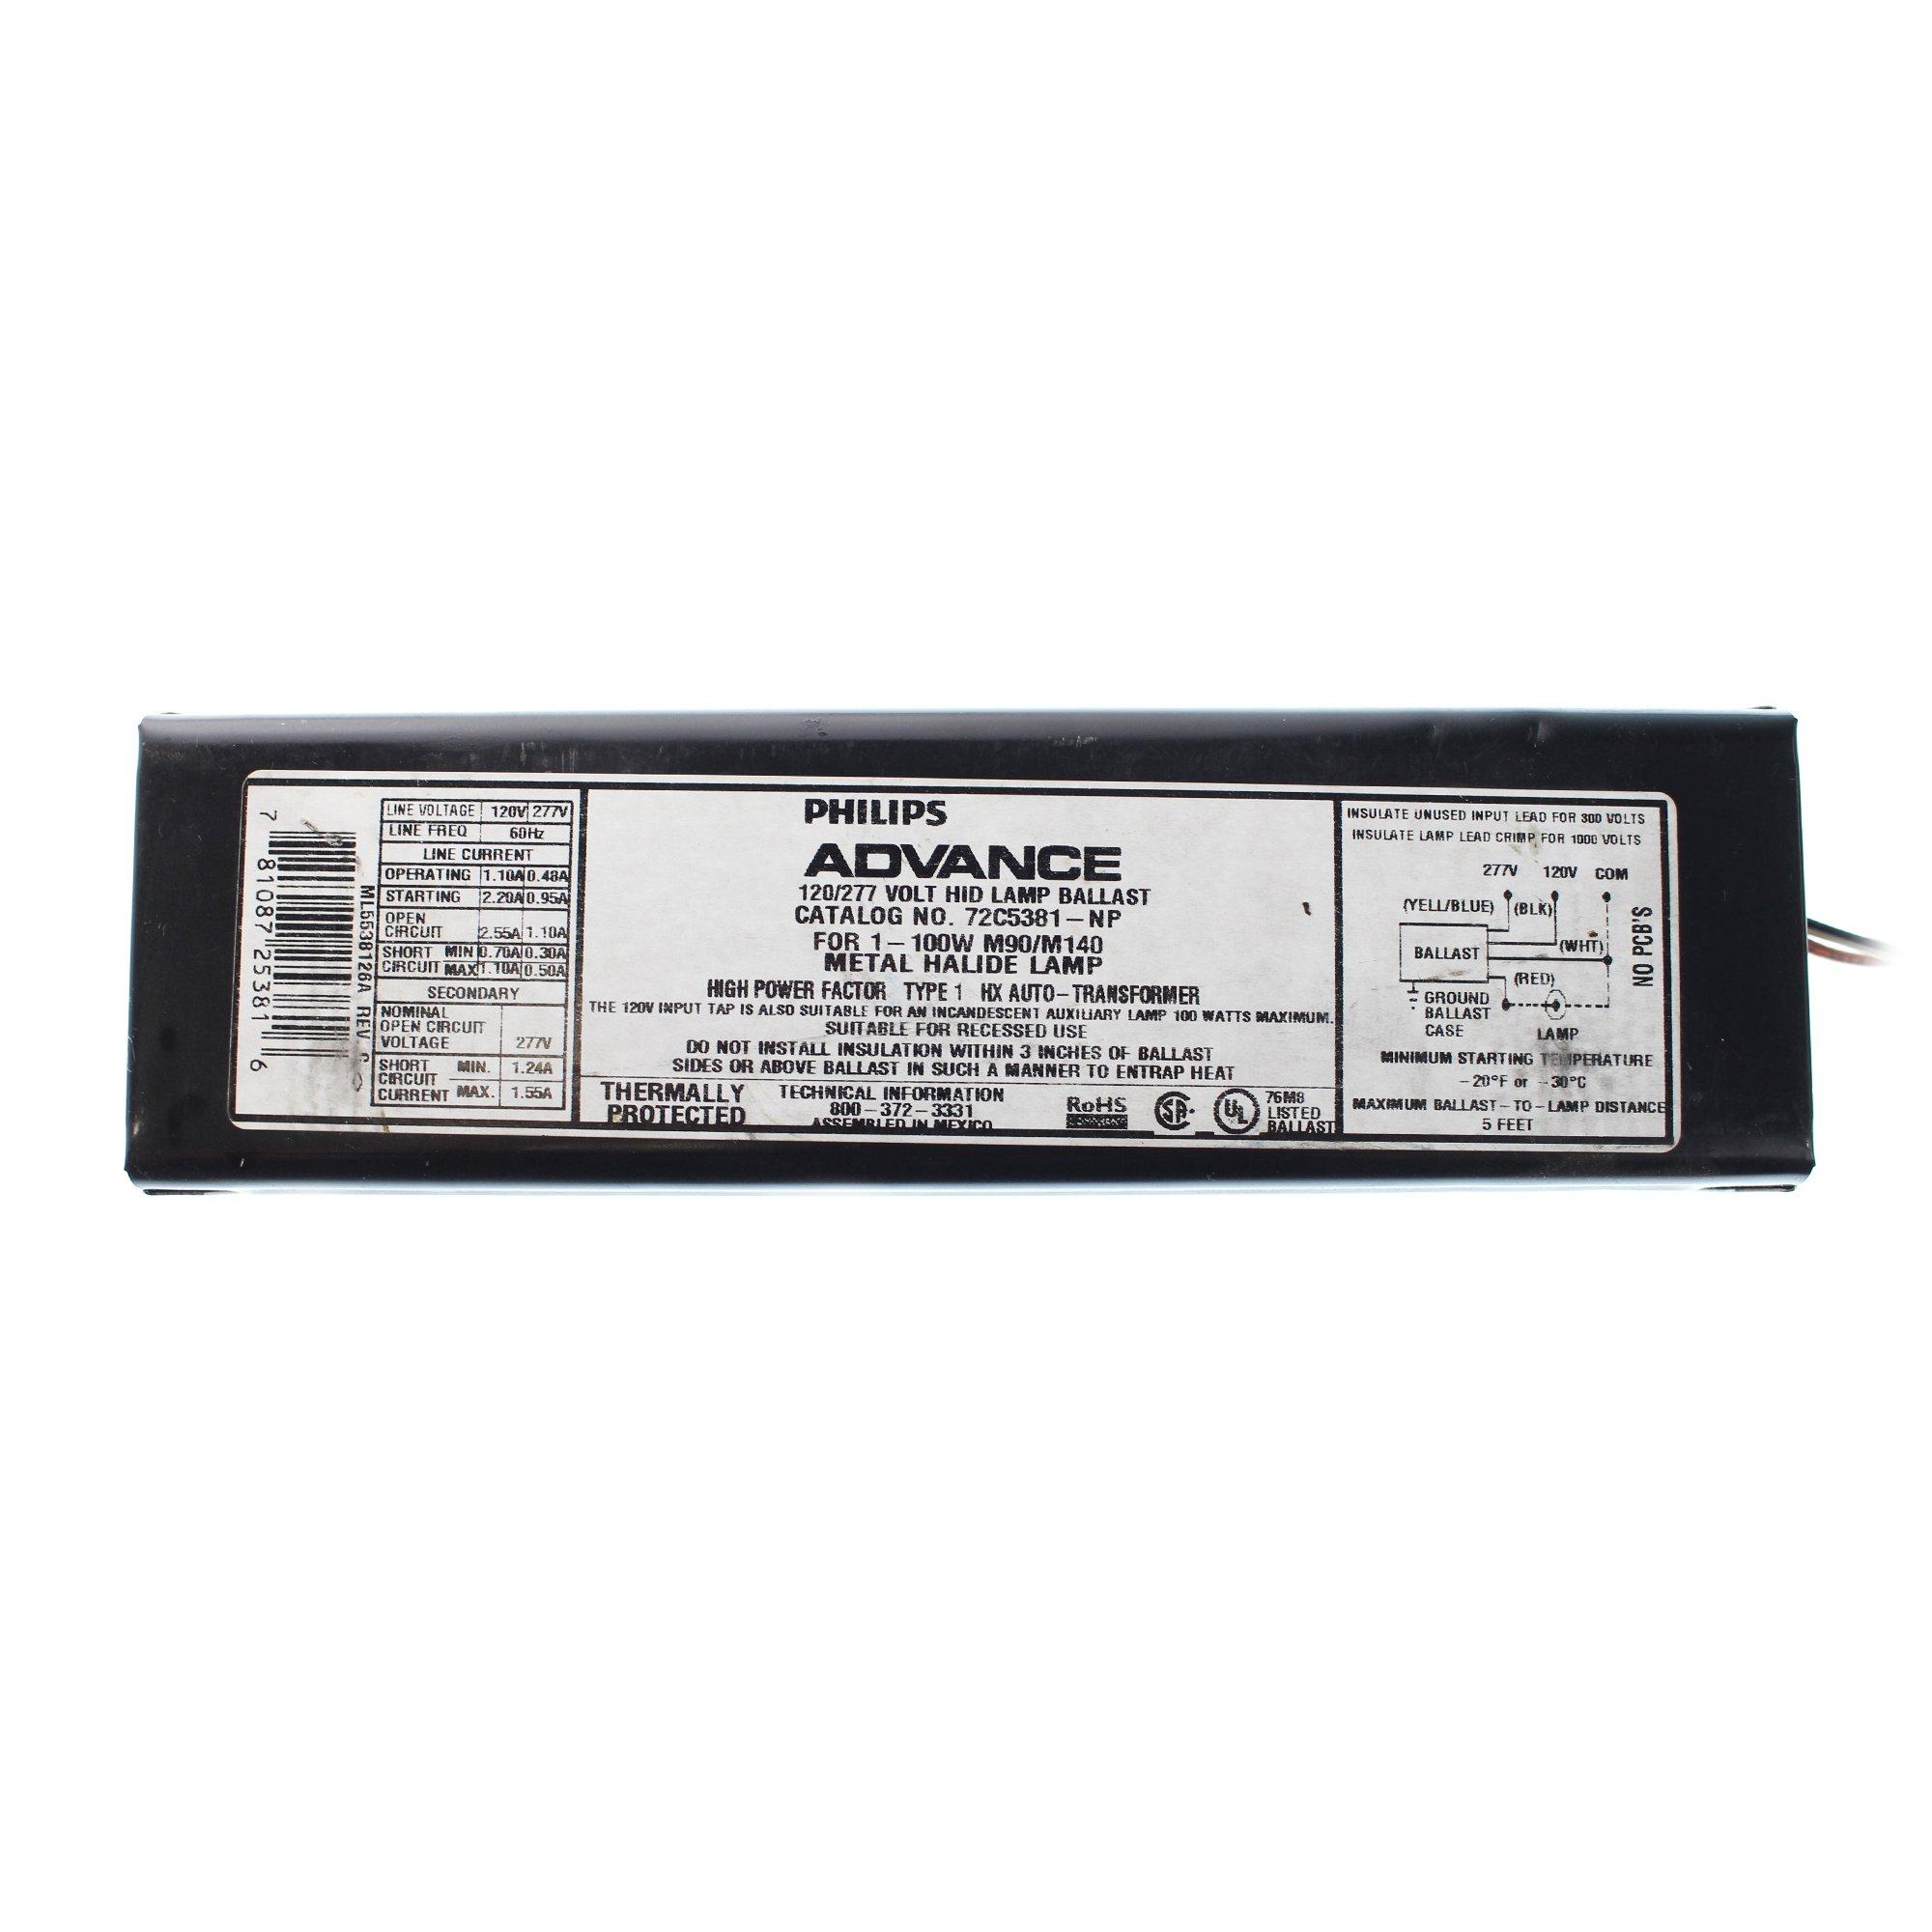 Advance 72C5381NP - 100 Watt - Pulse Start Metal Halide Ballast - ANSI M90/M140 - 120/277 Volt - Power Factor 90 - Side Leads with Mounting Feet